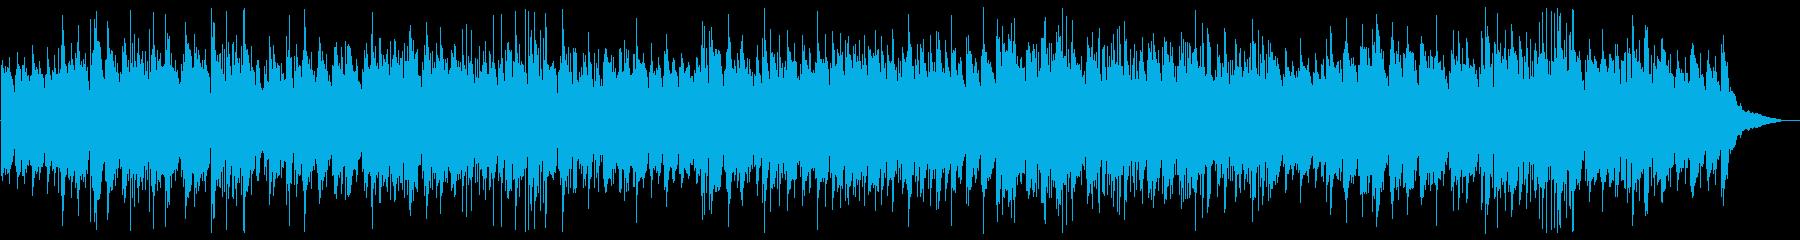 A farewell song Arranged by bossa nova's reproduced waveform